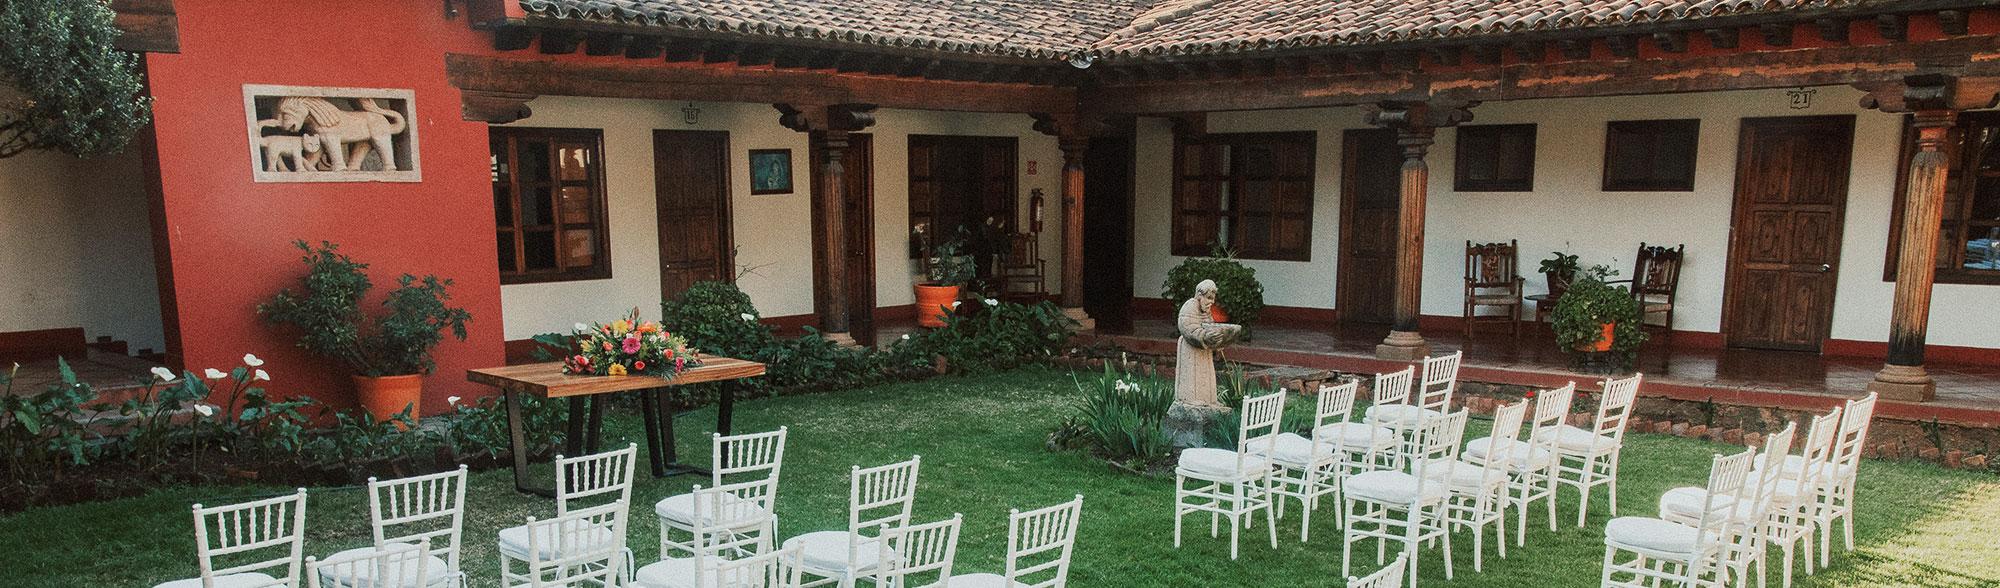 Hosteria San Felipe celebración soñada bodas y eventos